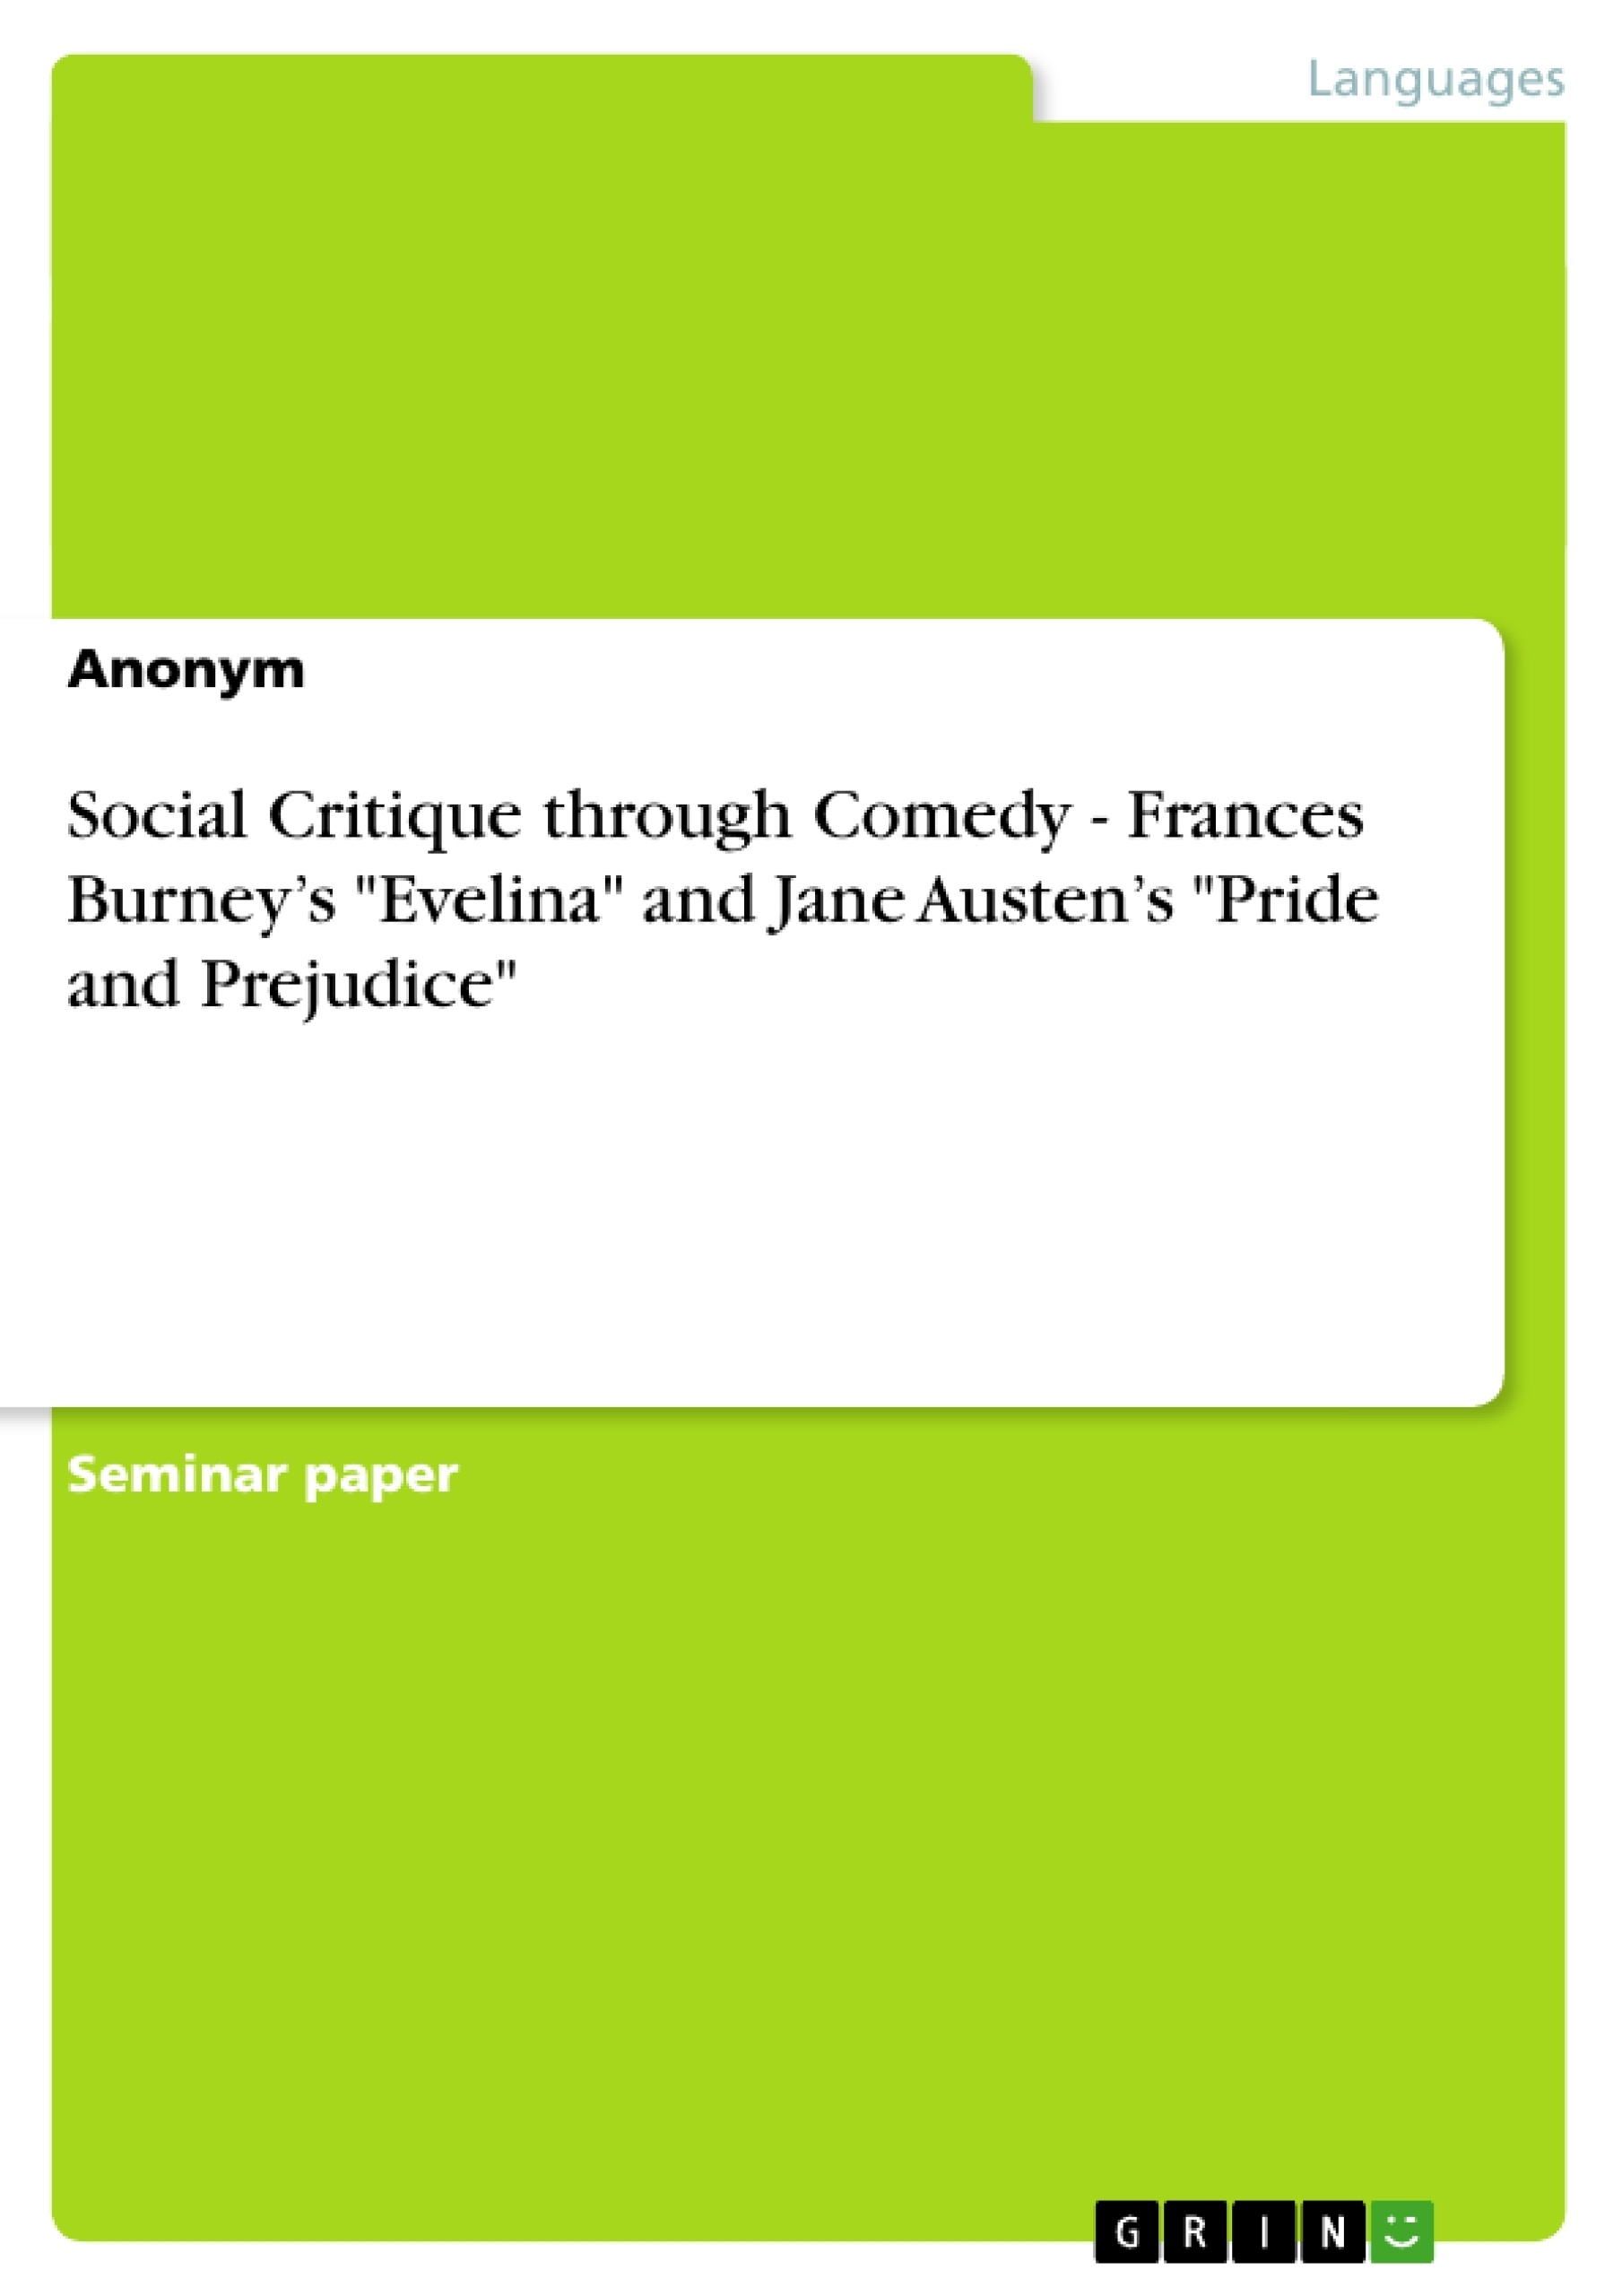 "Title: Social Critique through Comedy - Frances Burney's ""Evelina"" and Jane Austen's ""Pride and Prejudice"""